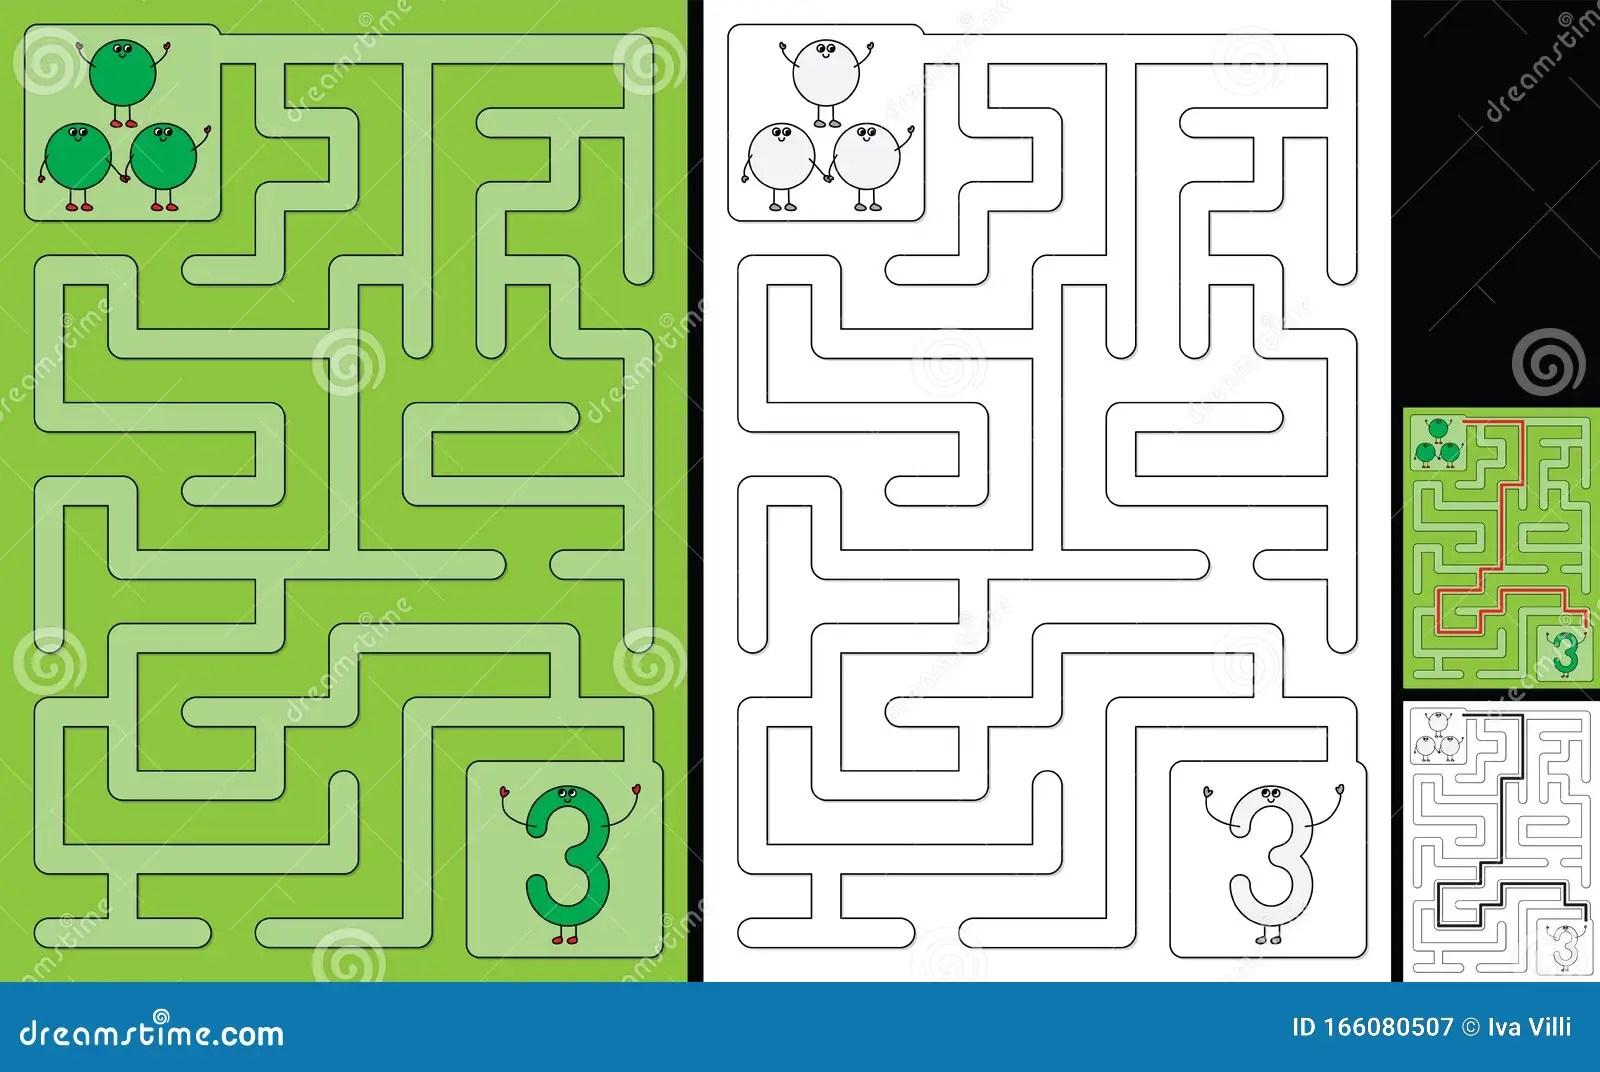 Easy Number Maze